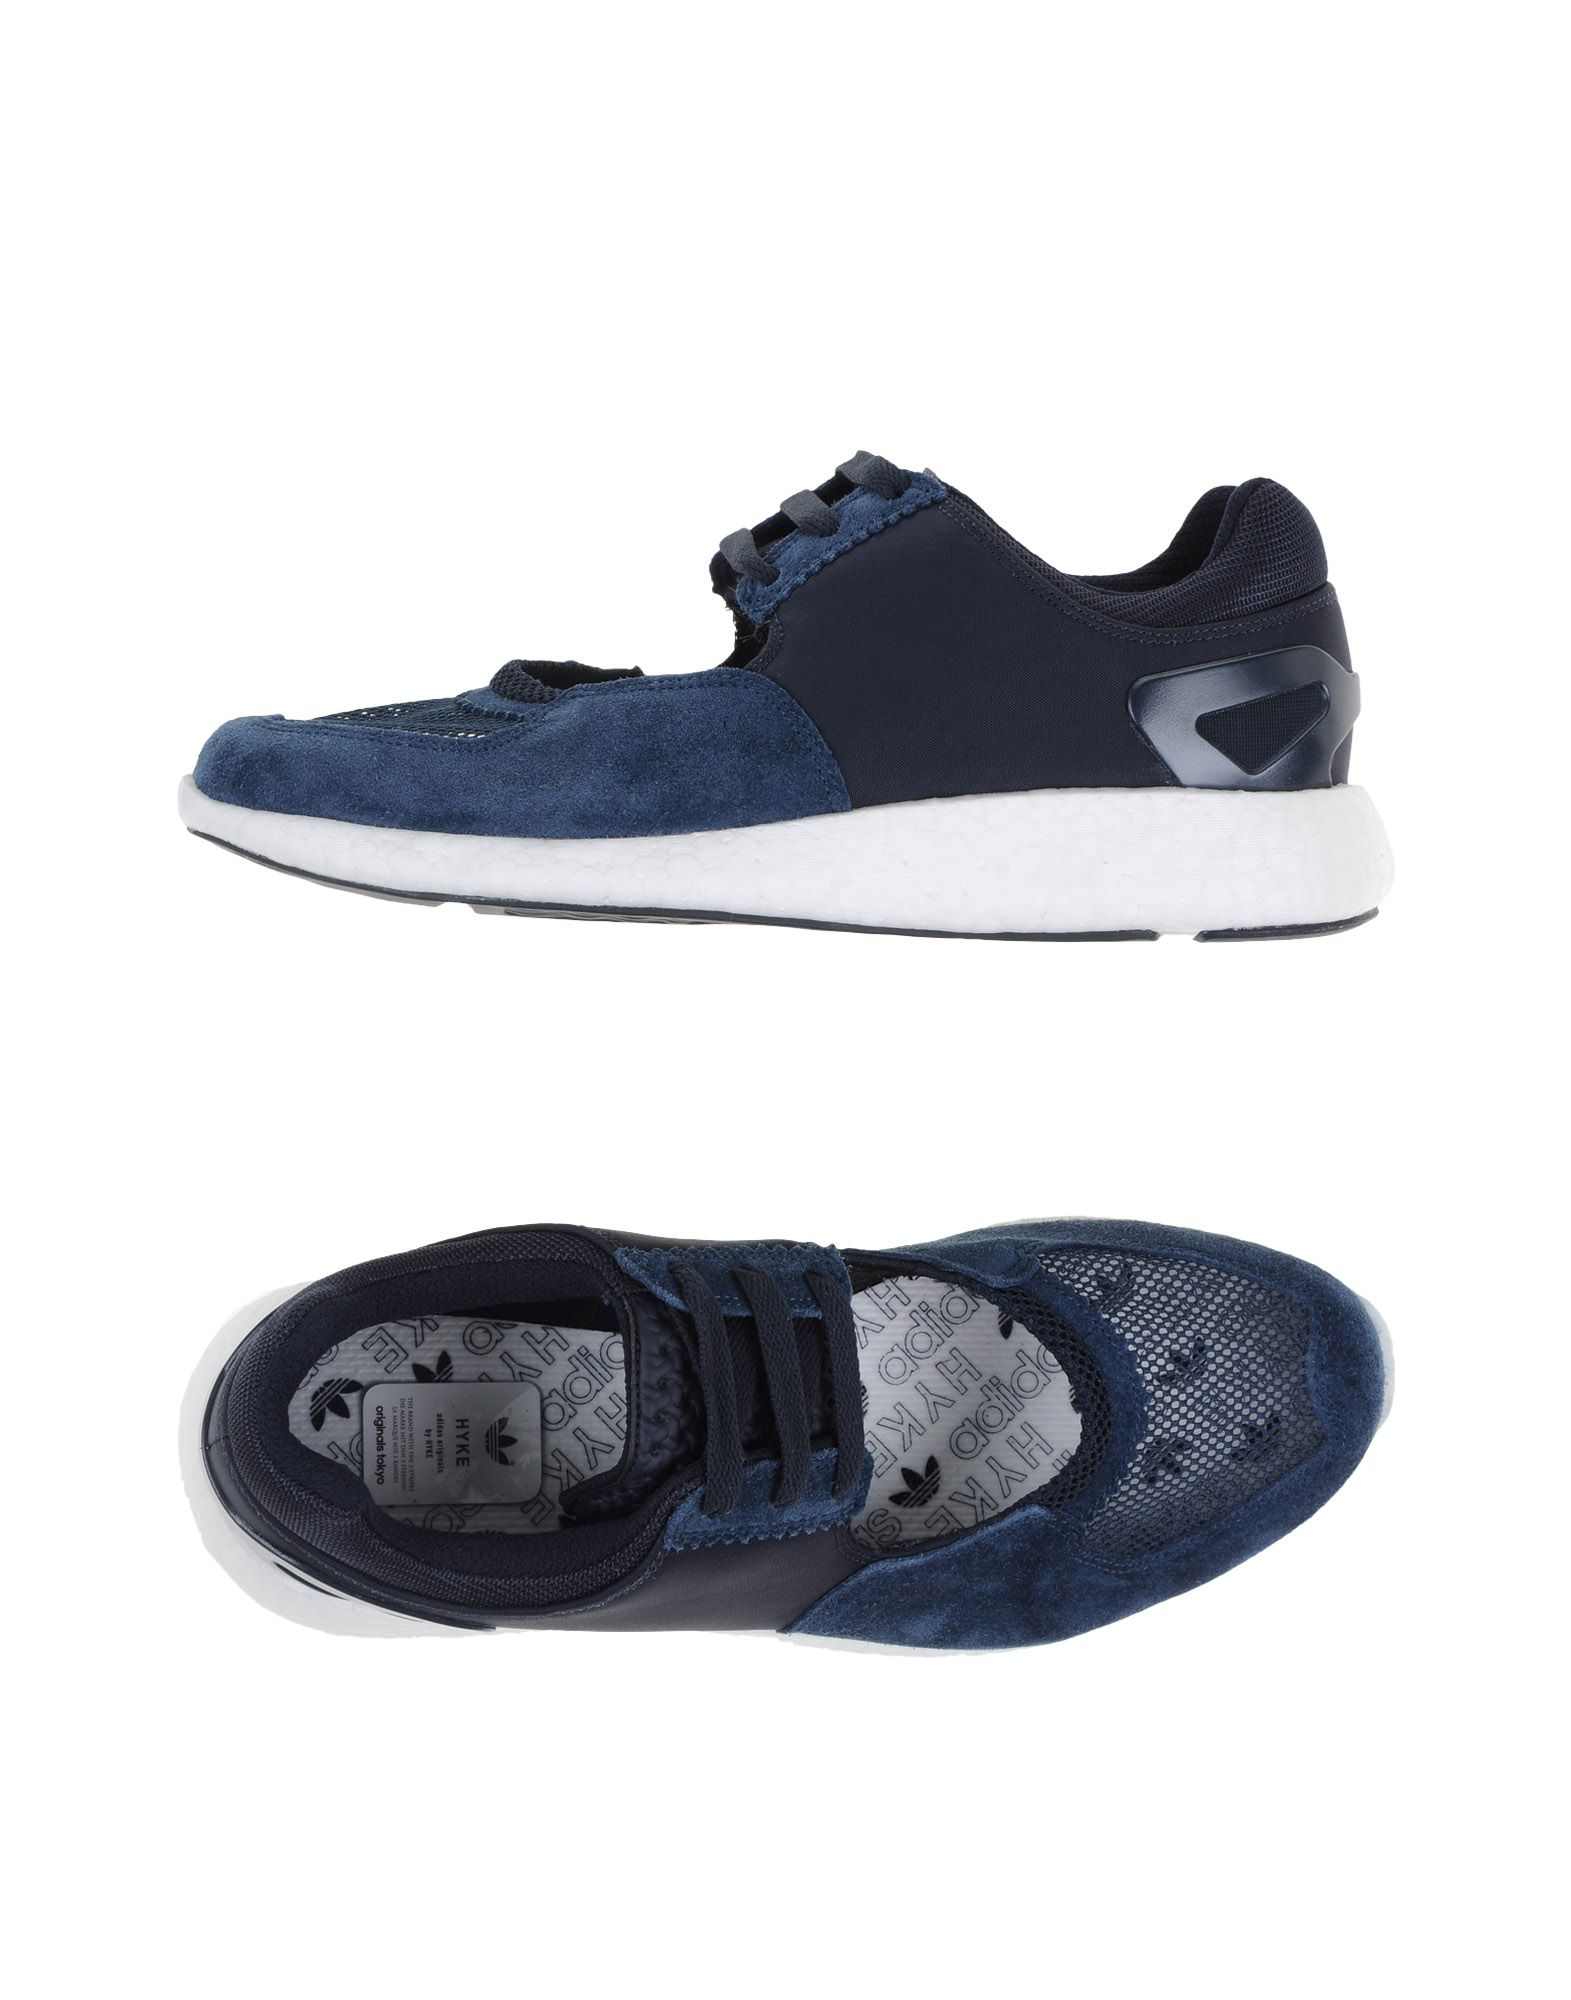 Adidas Originals By Hyke Aoh-007 - Sneakers - Women Adidas online Originals By Hyke Sneakers online Adidas on  United Kingdom - 11030375BS f8d7fb